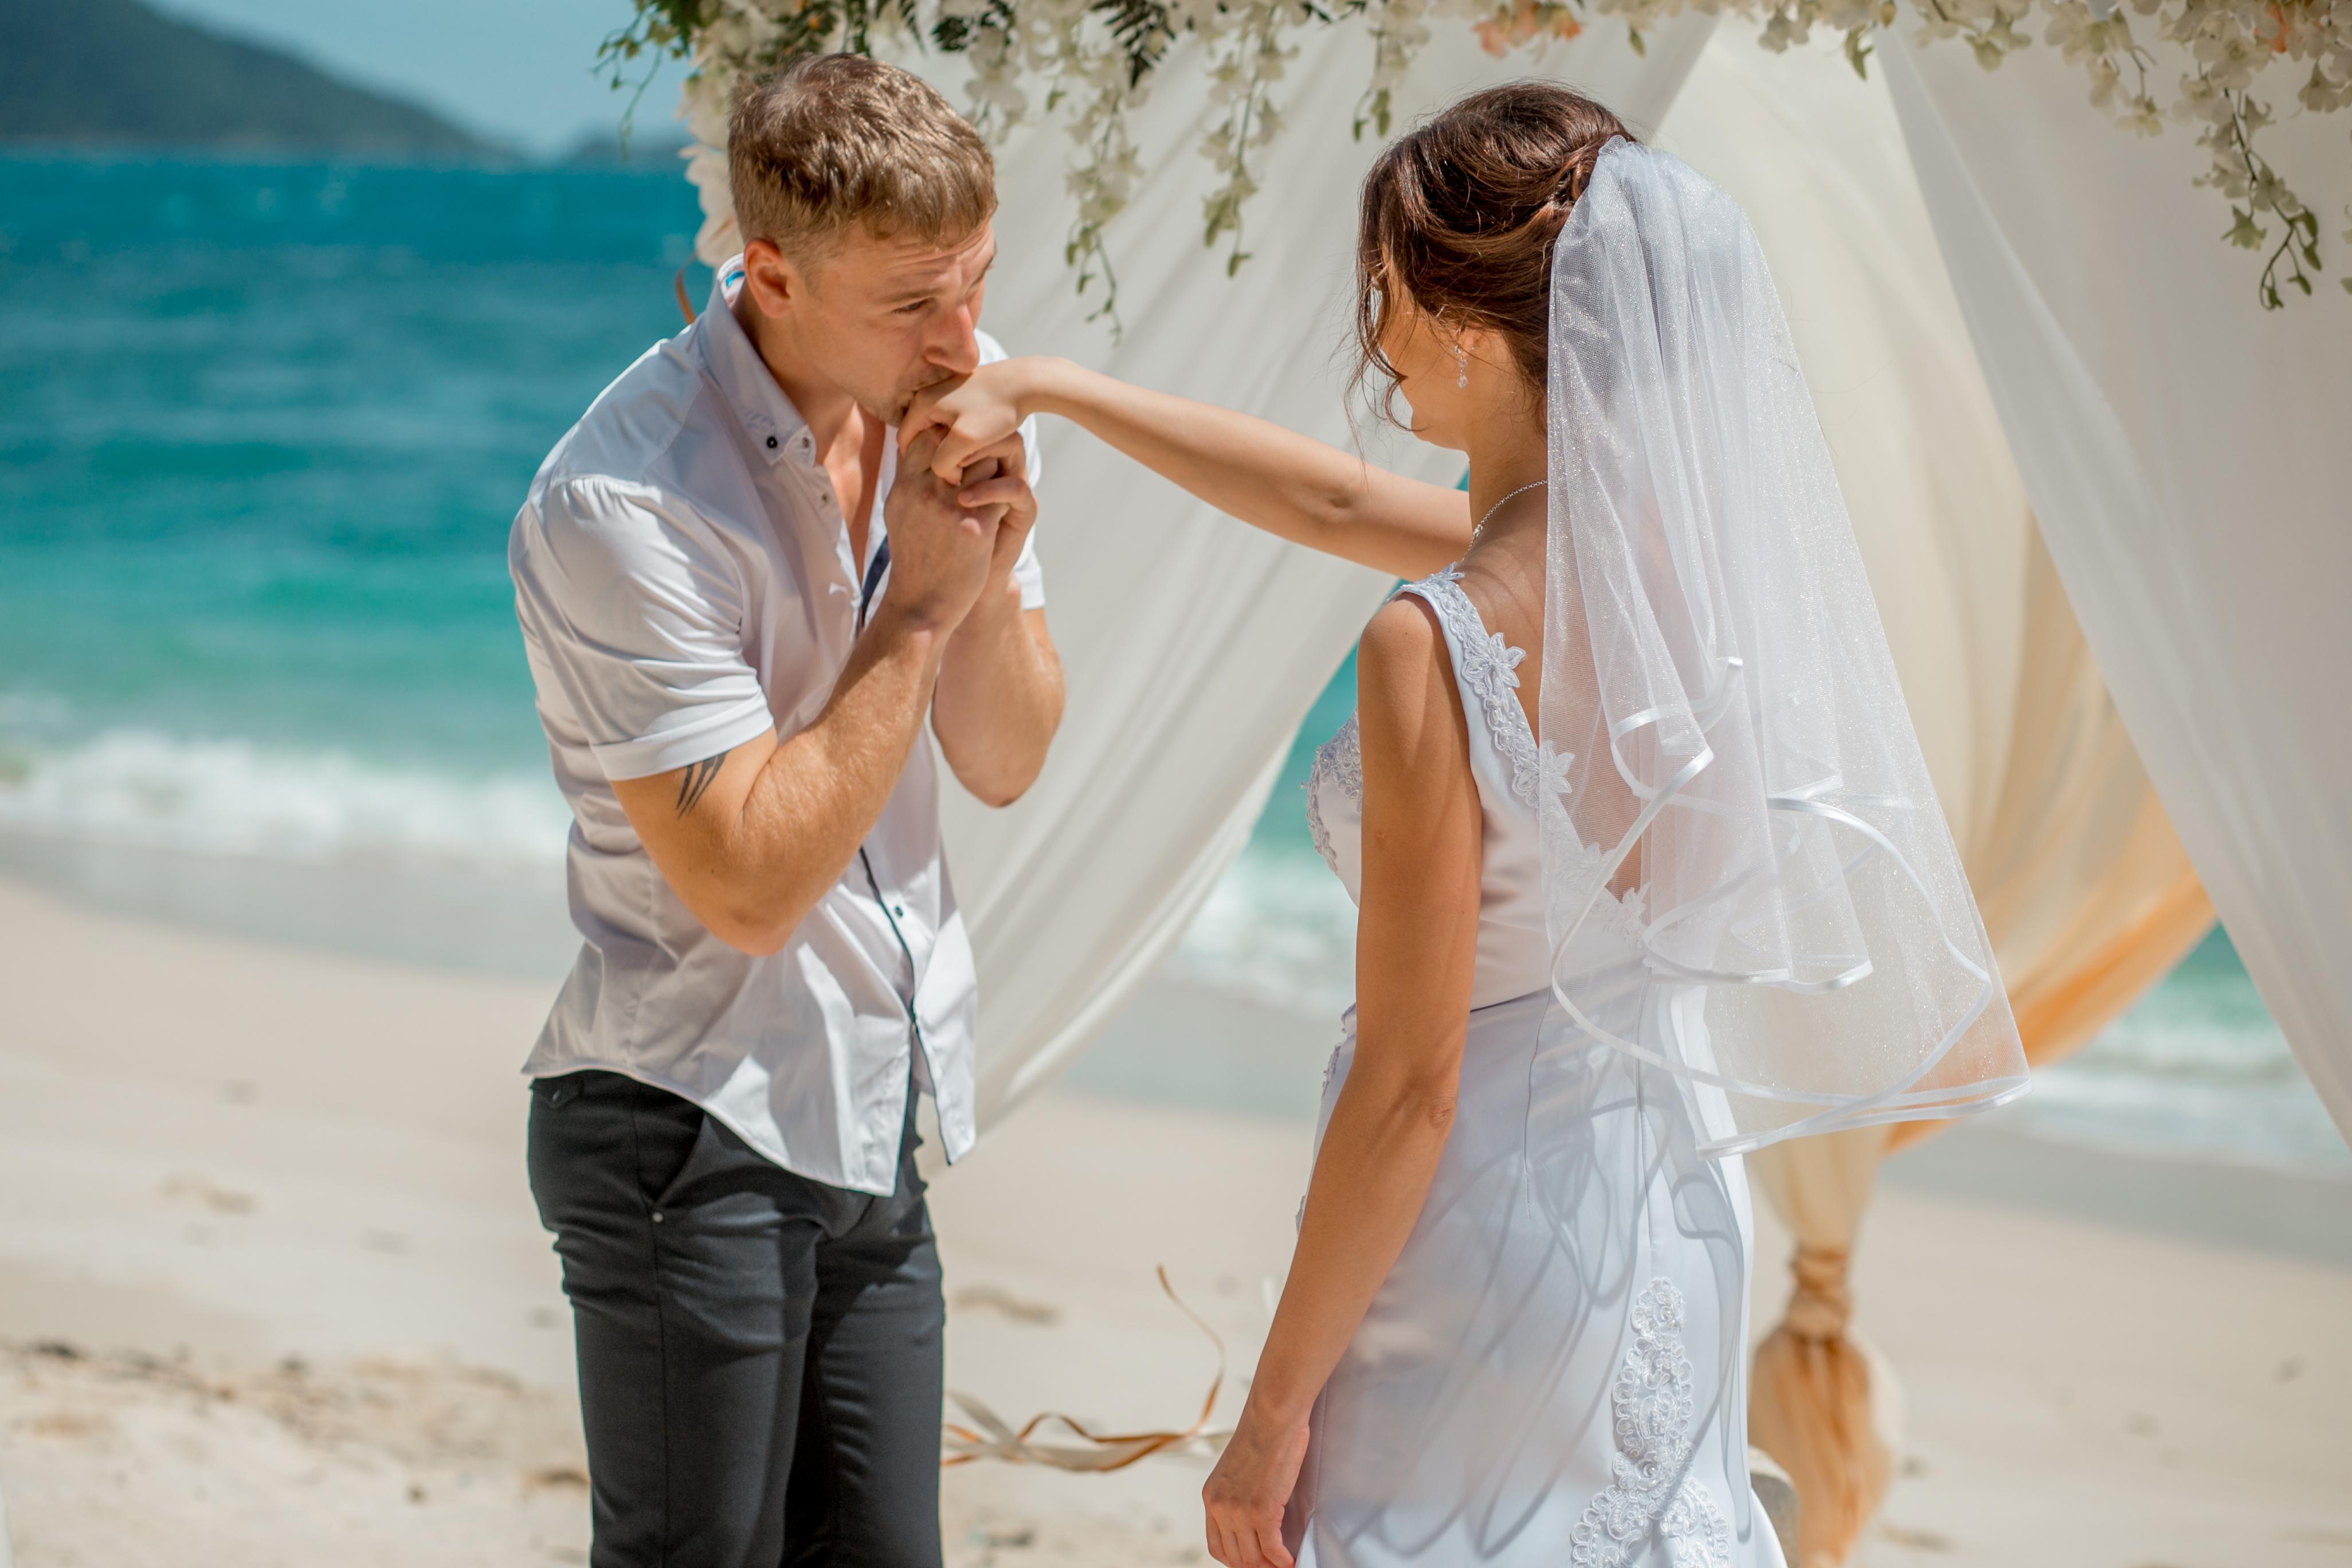 59Порно уединились на свадьбе